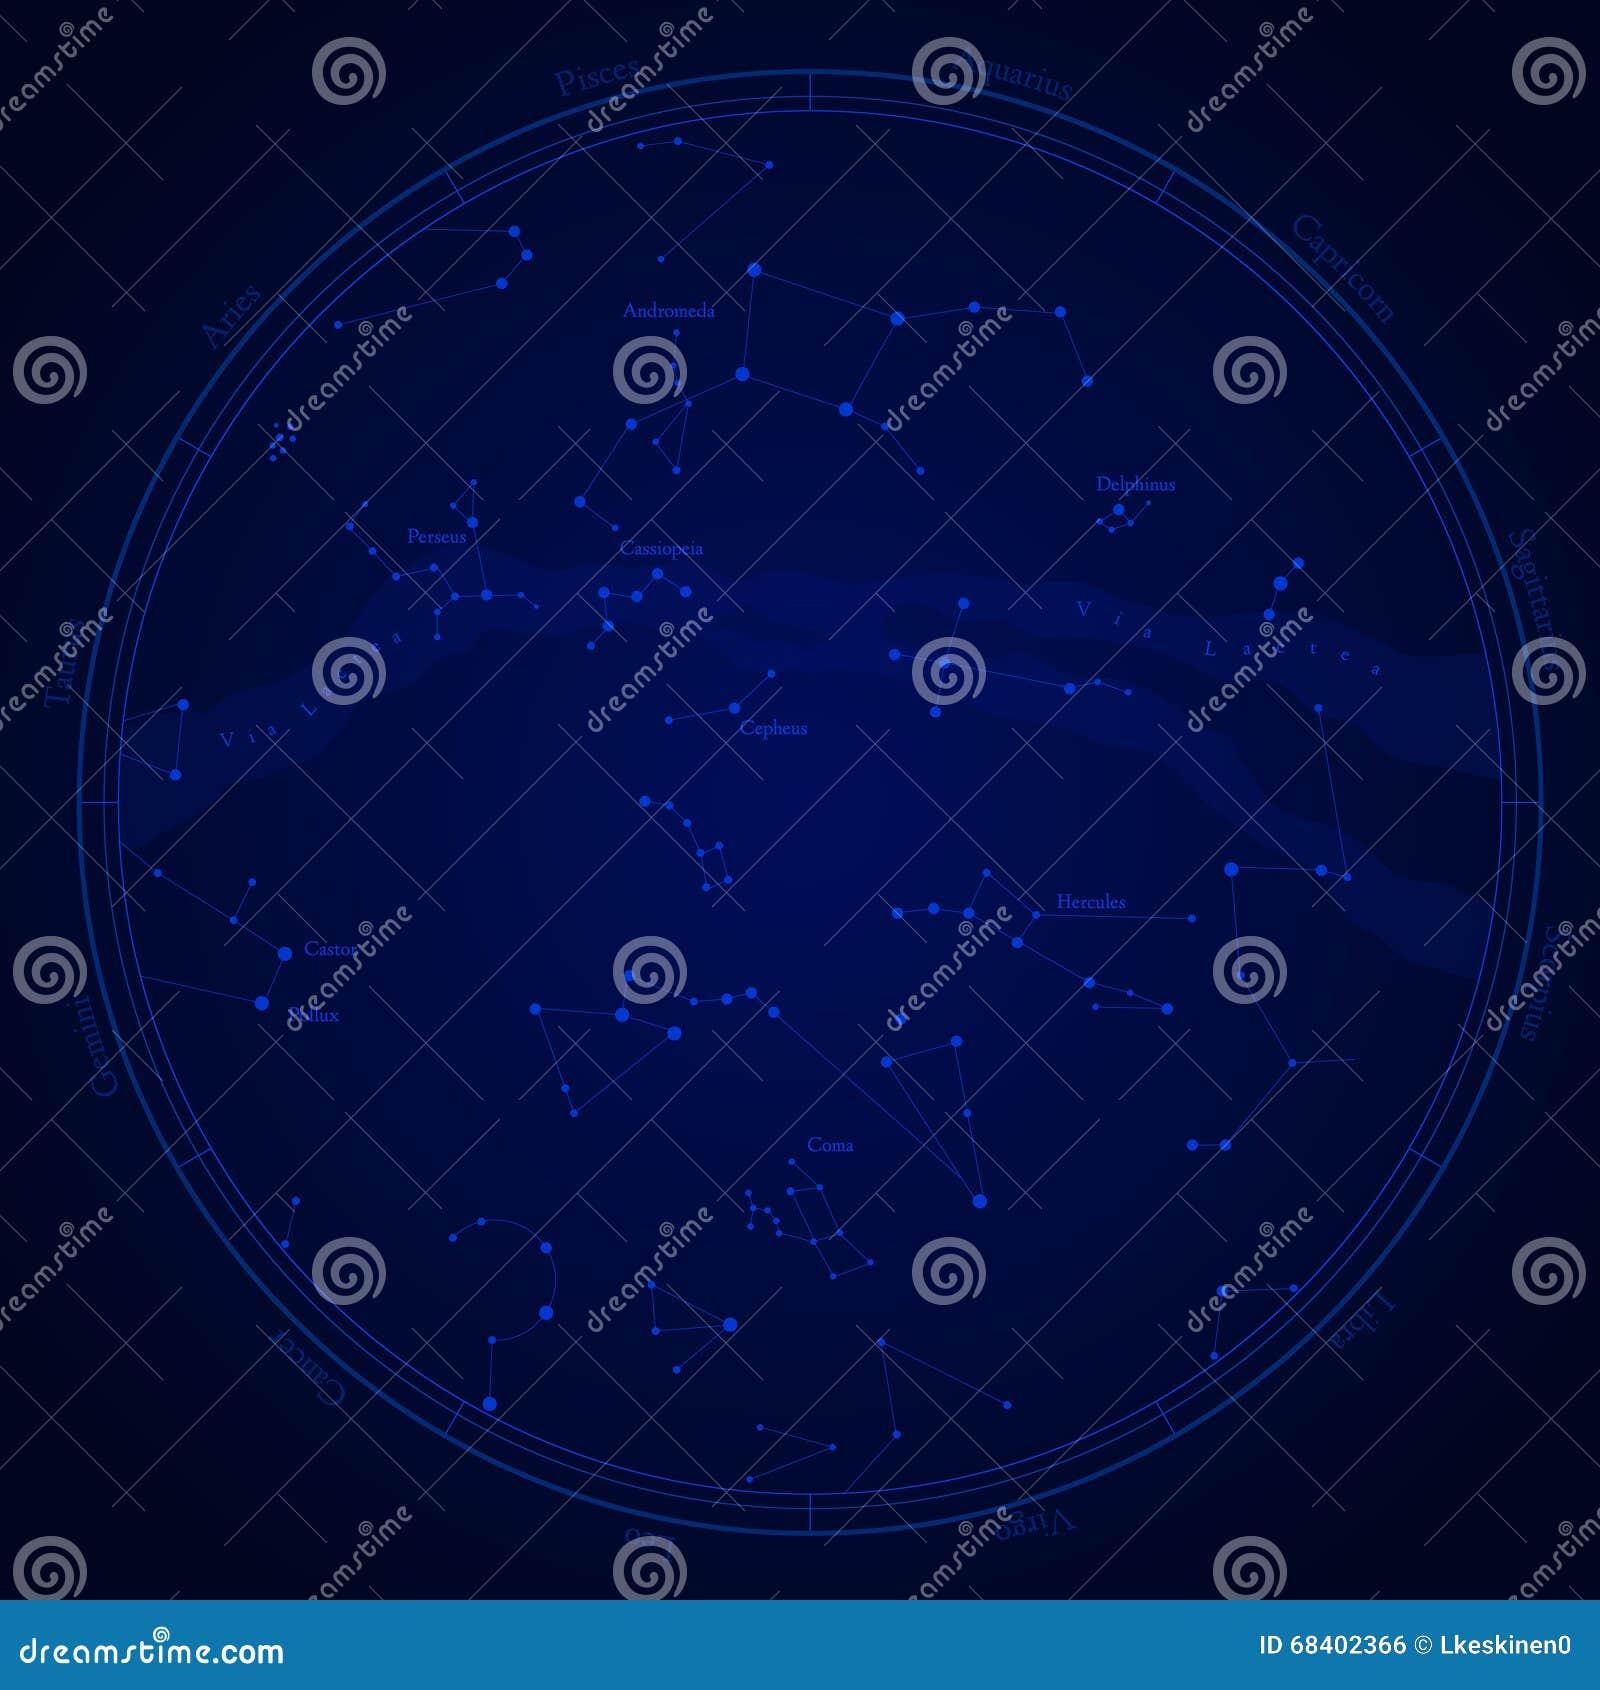 Zodiac Star Map Stock Illustration Illustration Of Astronomy 68402366